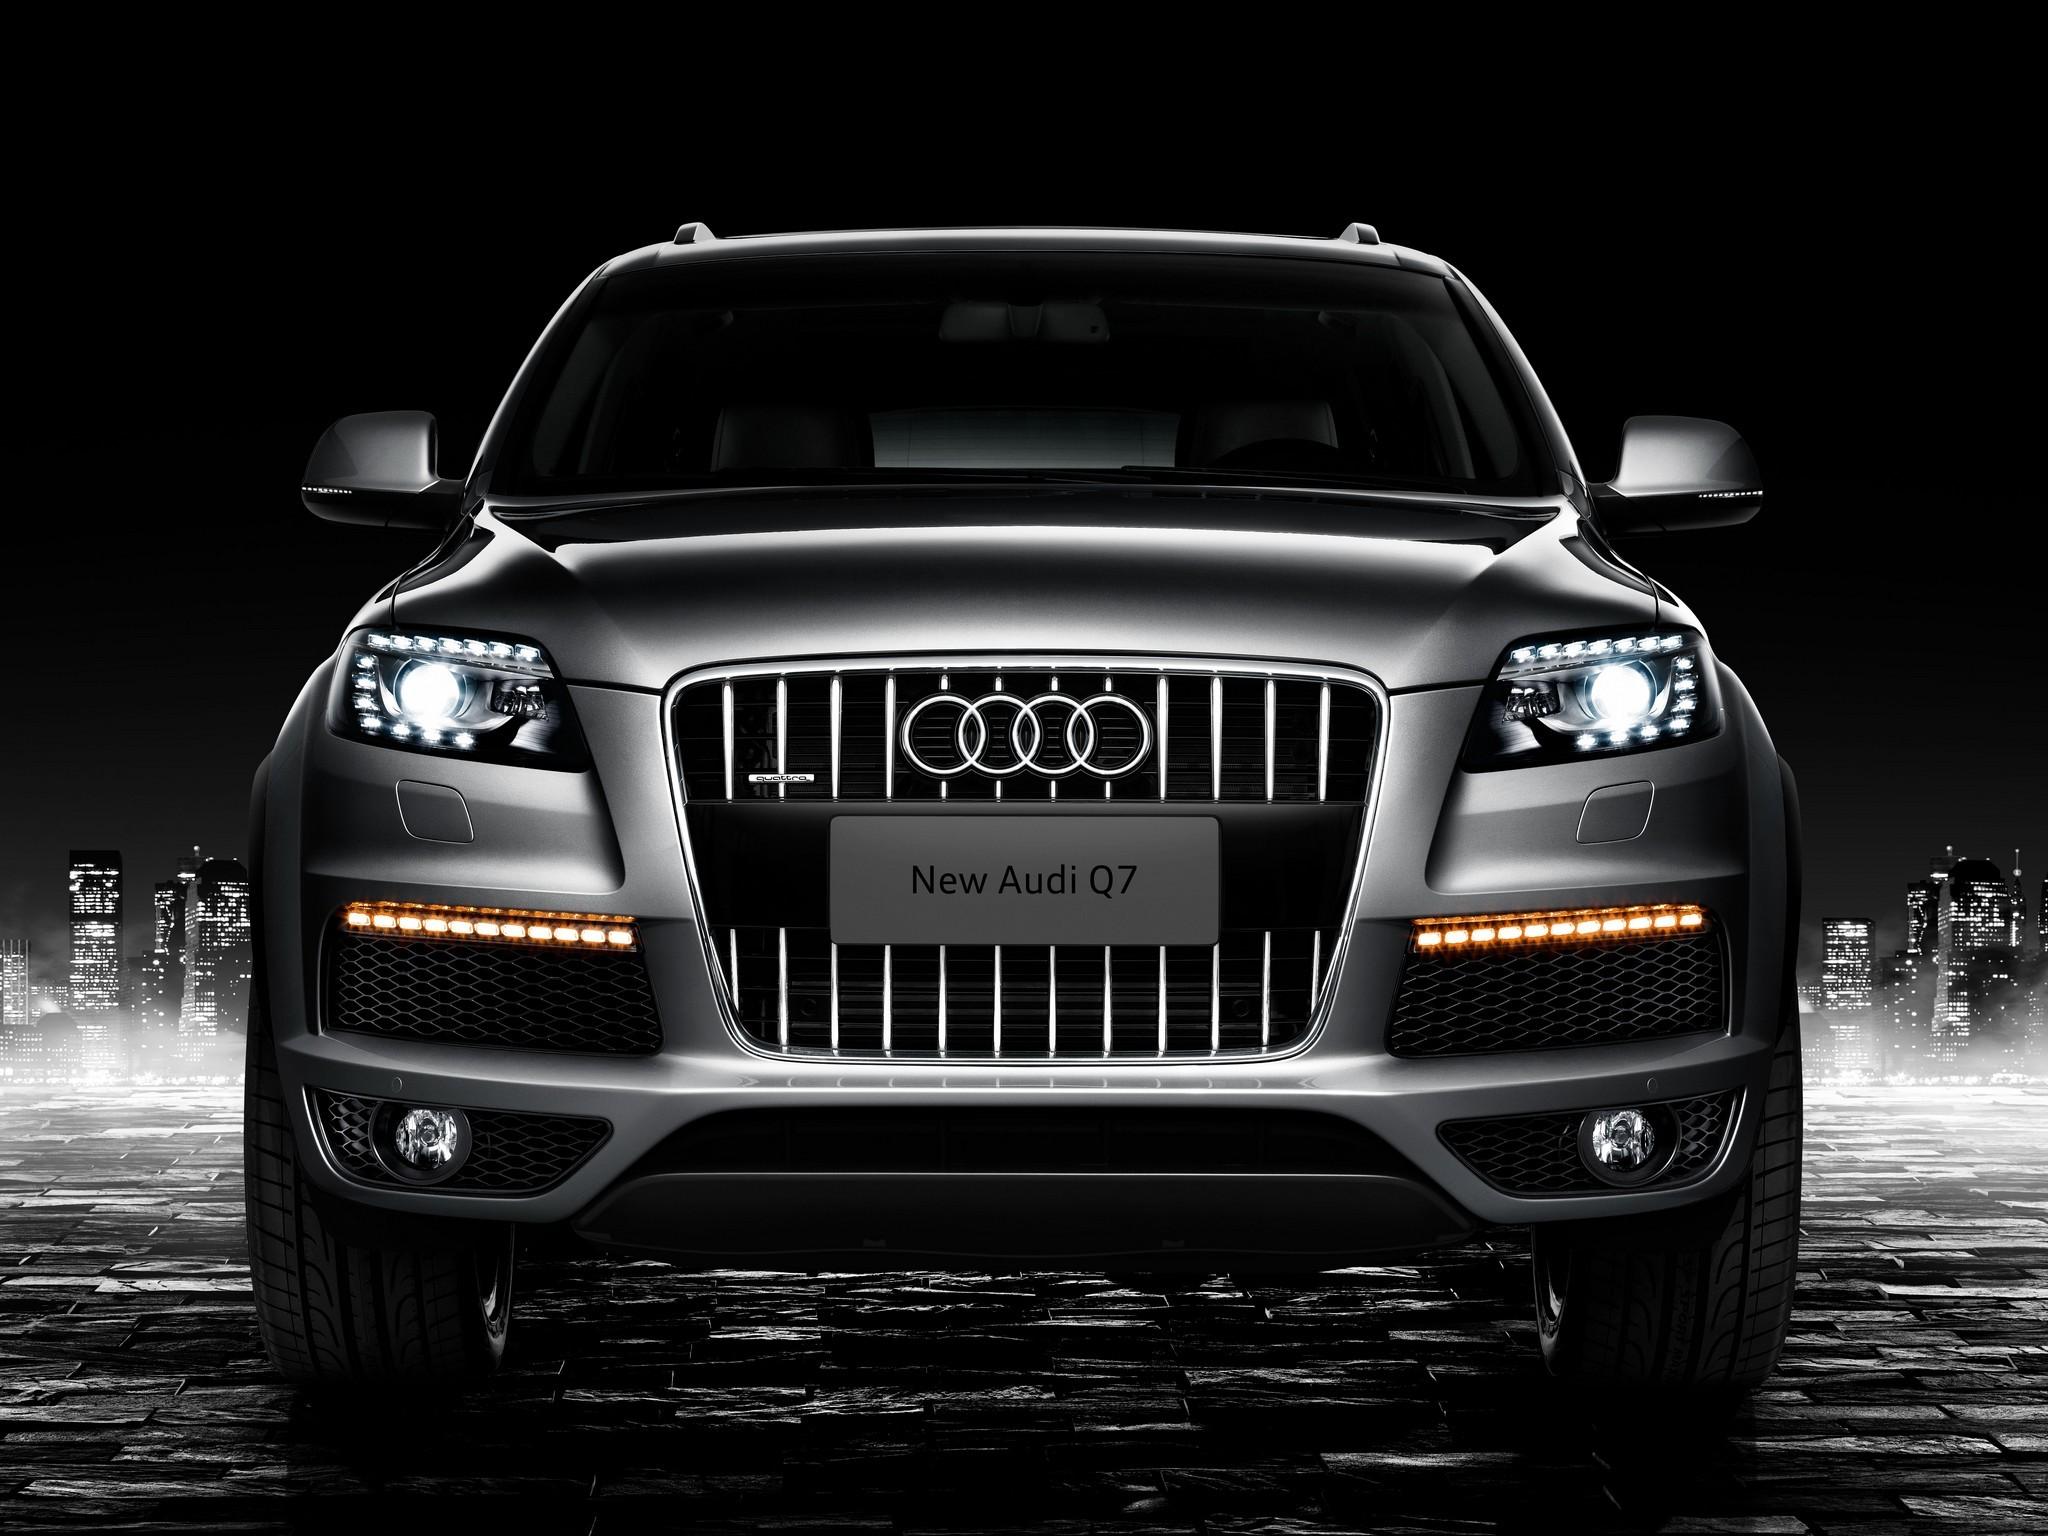 Audi Q7 Images Hd The Audi Car